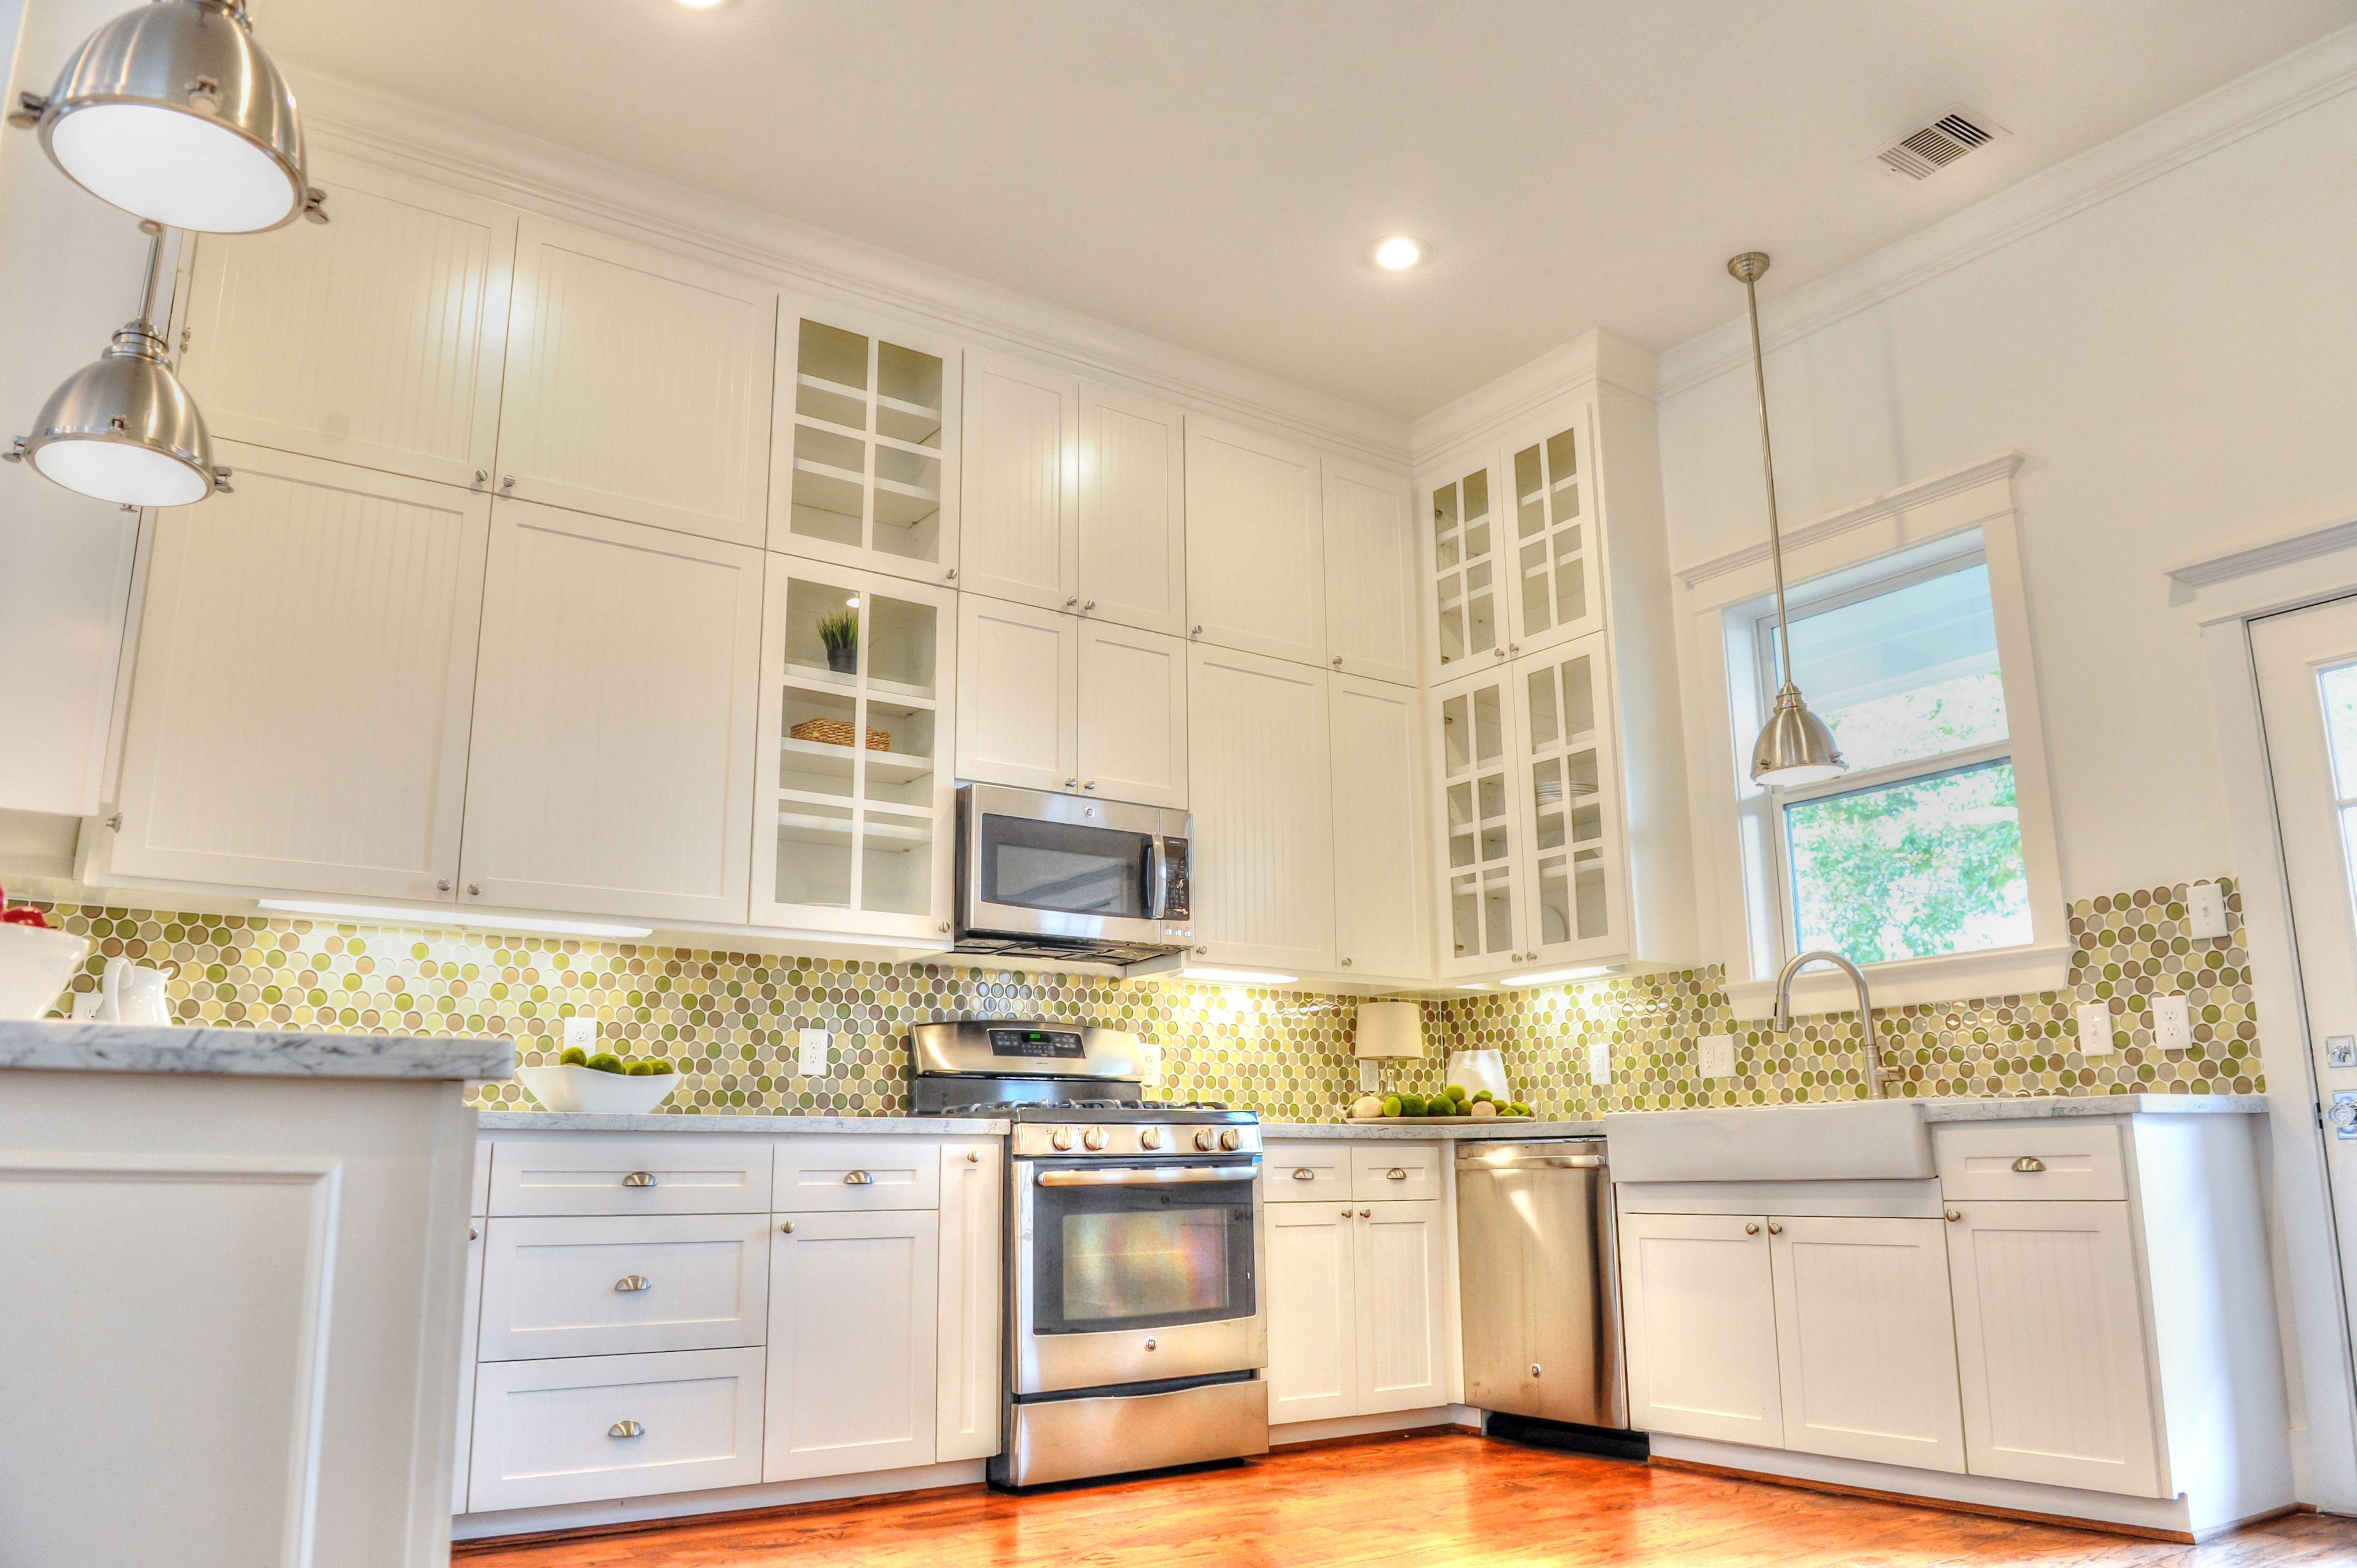 Modern Kitchen Cabinets Houston Heights Bungalows